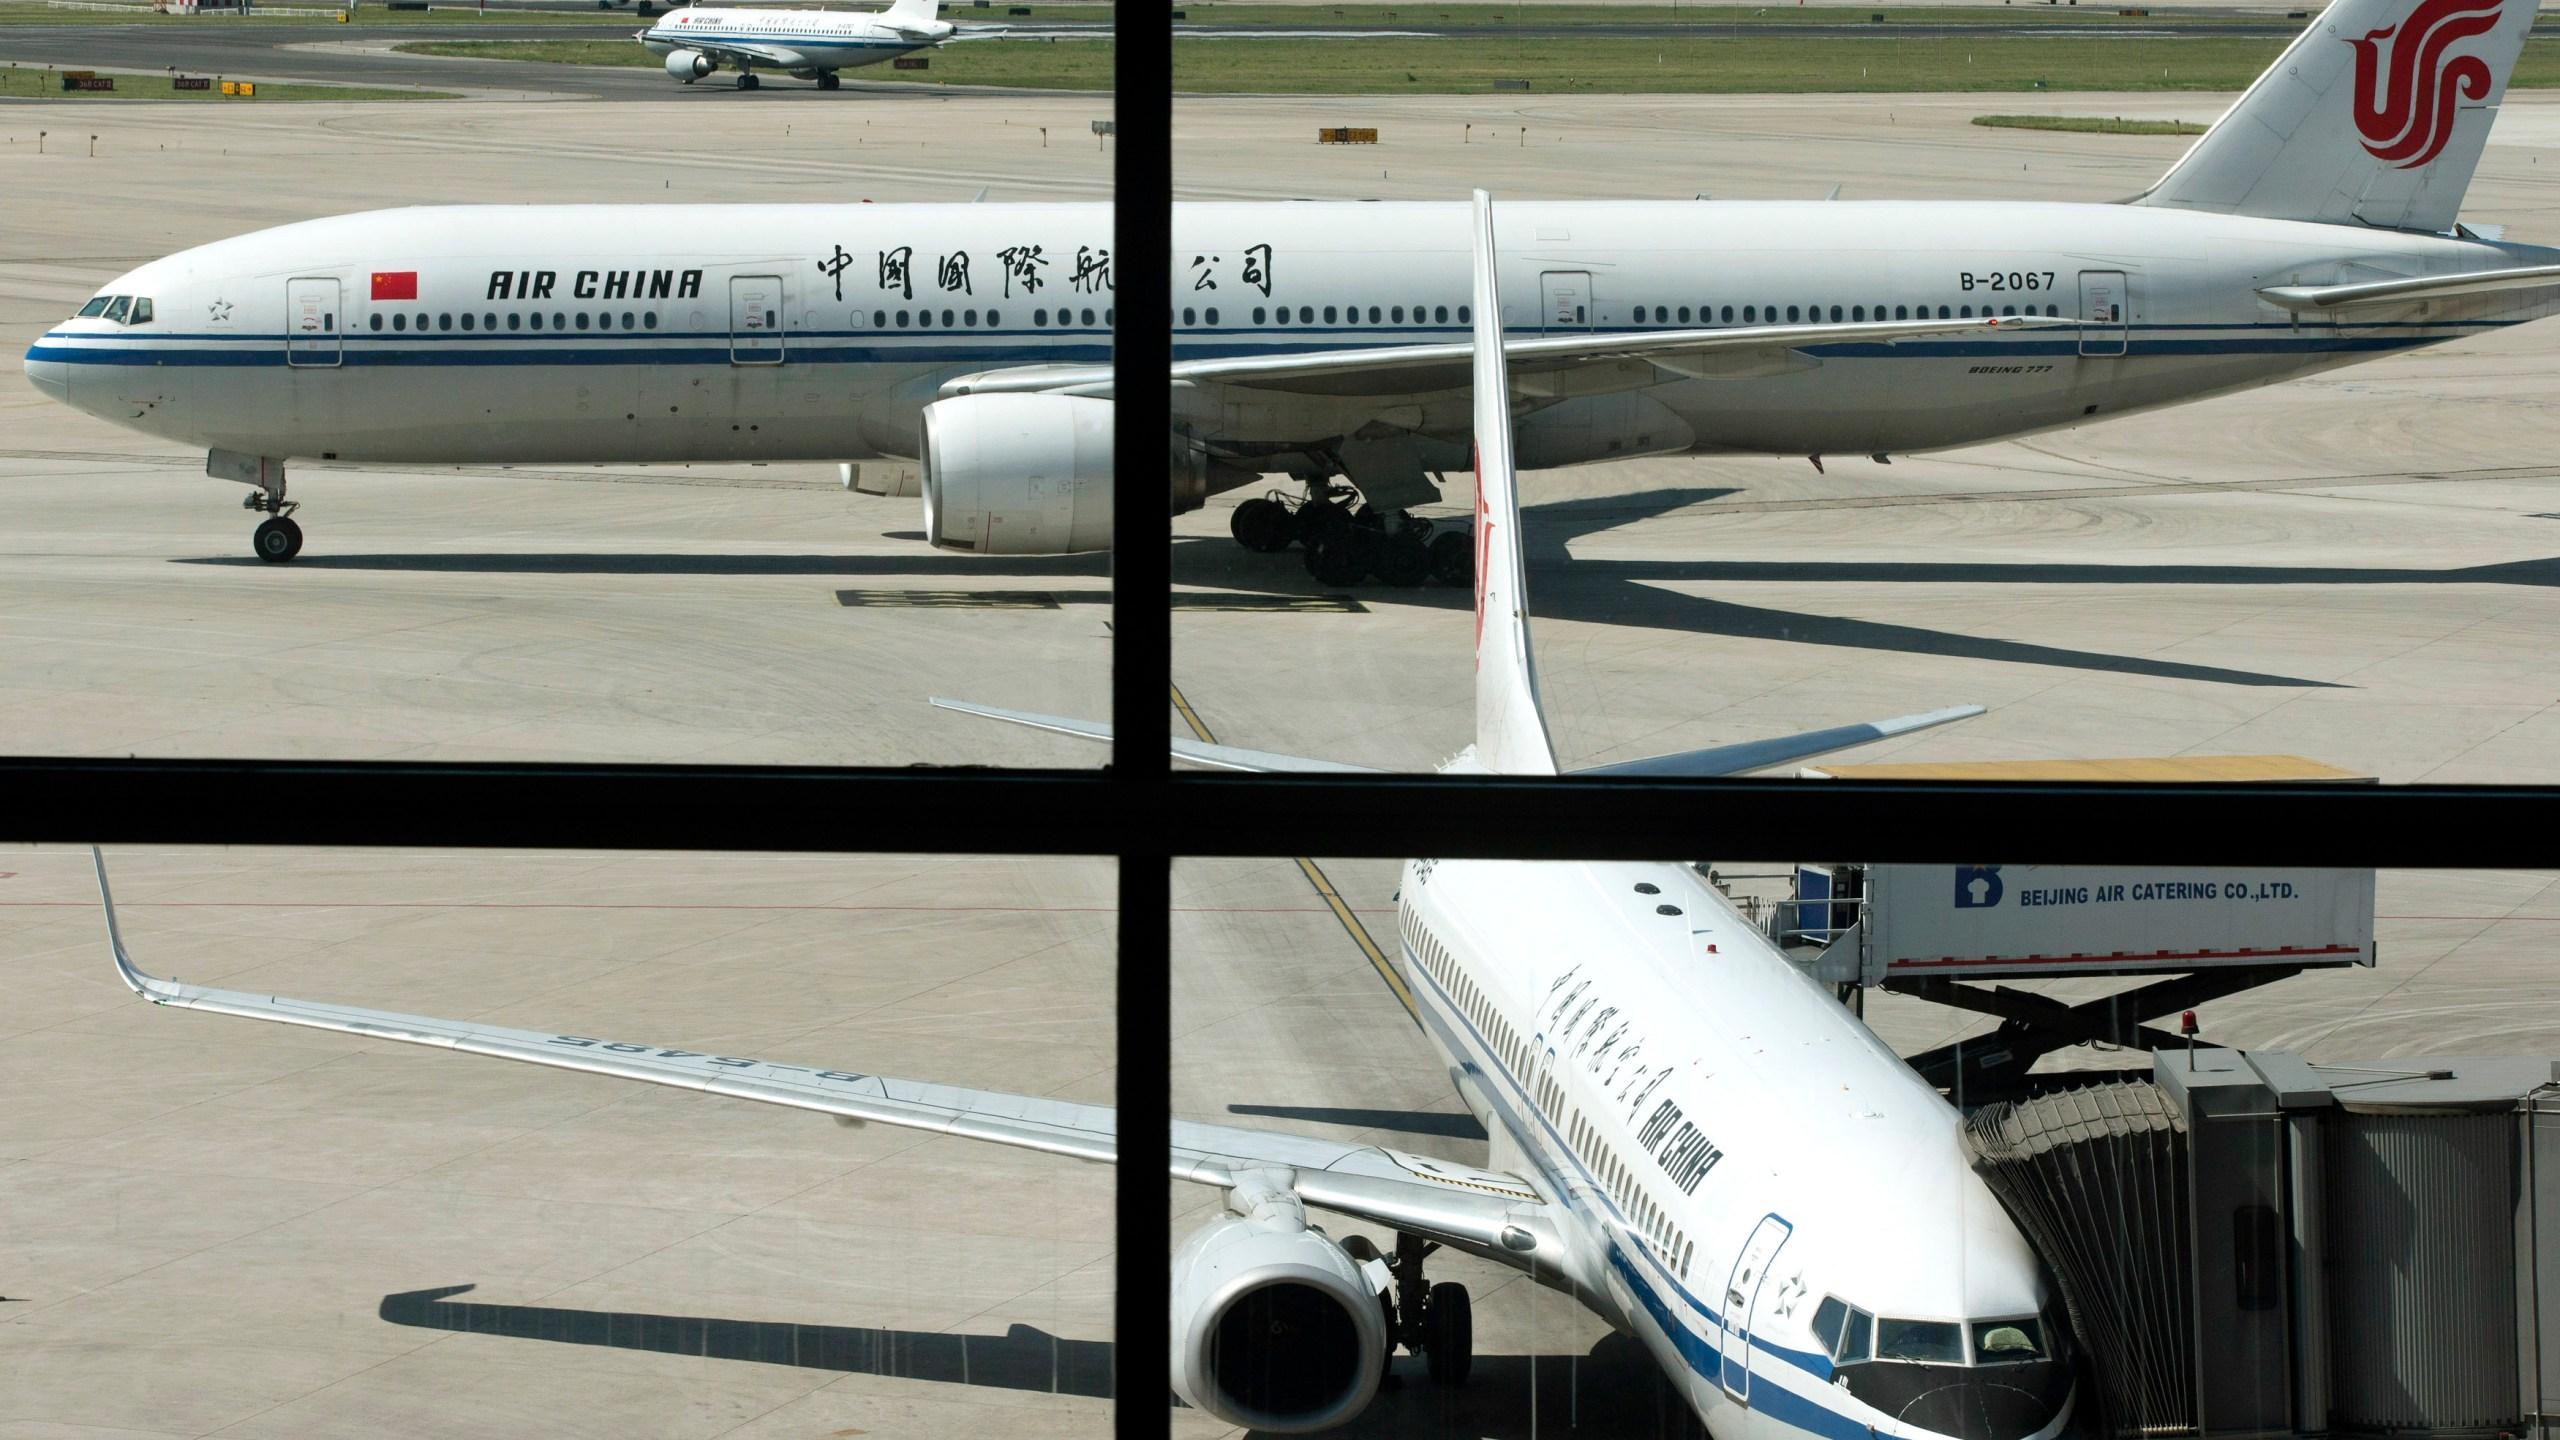 FILE PHOTO Air China China Britain Offensive Article Photo by Alexander F. Yuan, AP Photo_213476